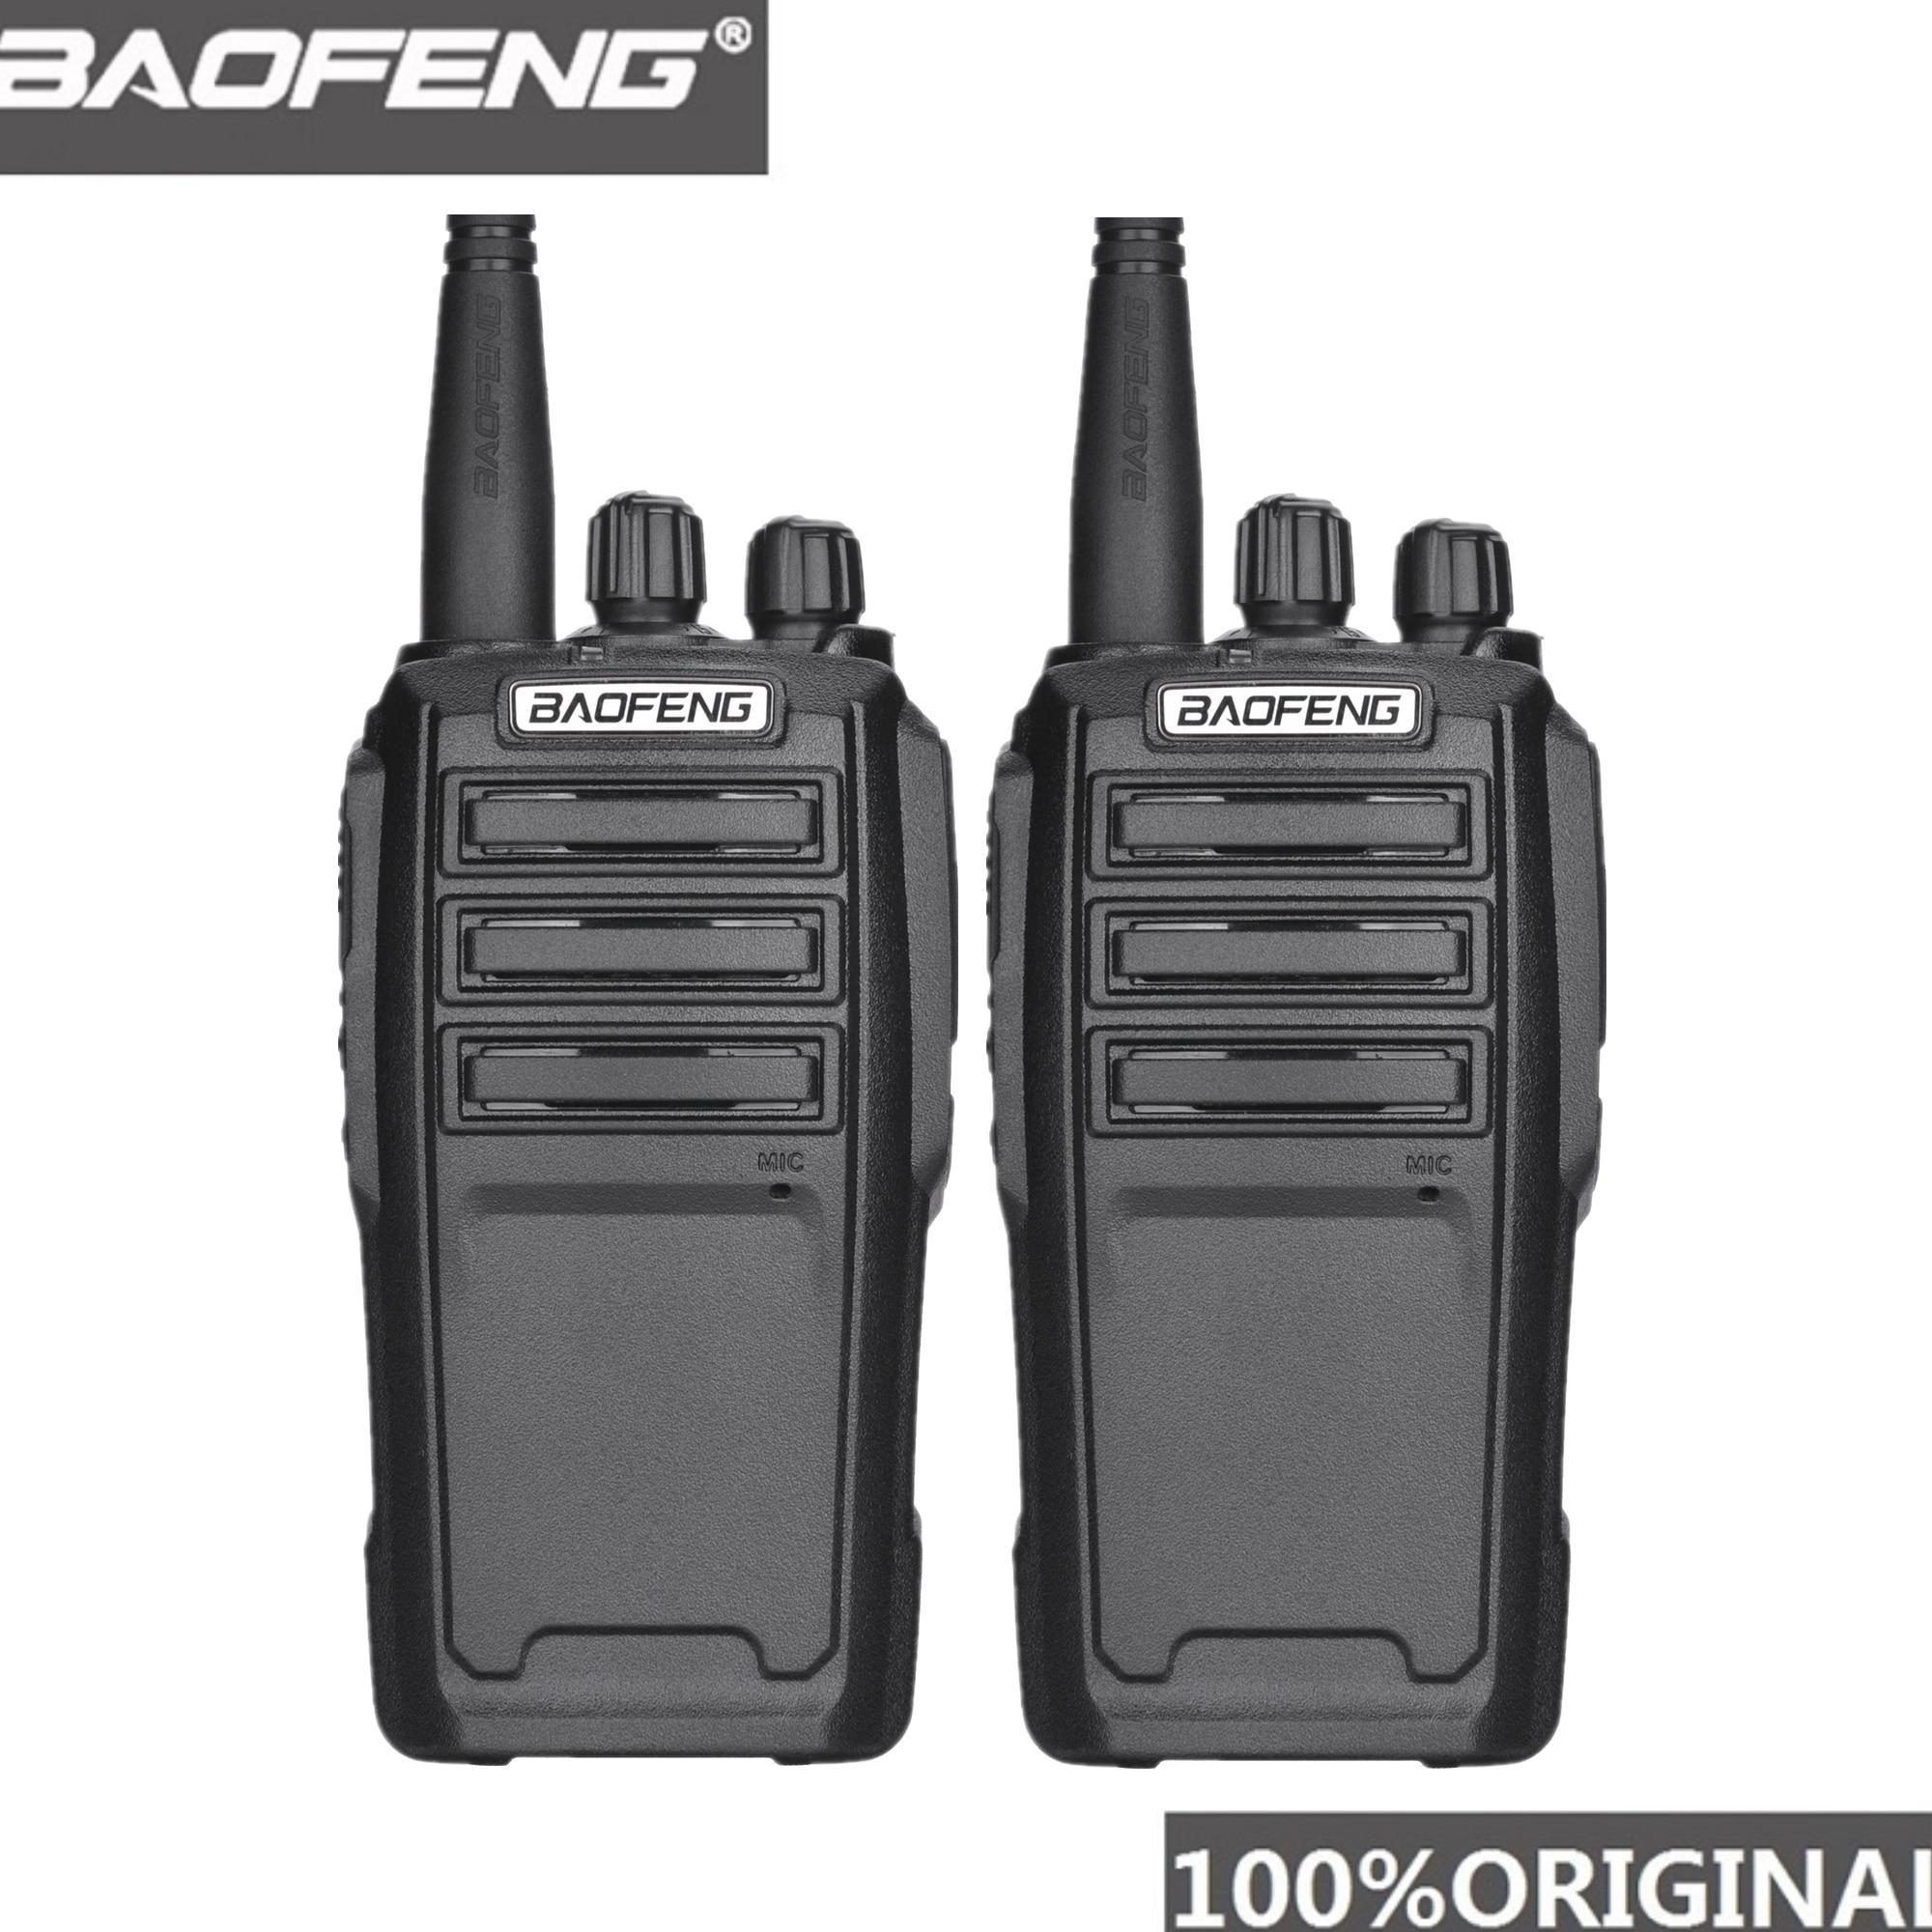 2PCS Baofeng UV-6 8W Ham Radio Security Guard Equipment Two Way Radio Encrypted Handheld Walkie Talkie Ham Radio HF Transceiver